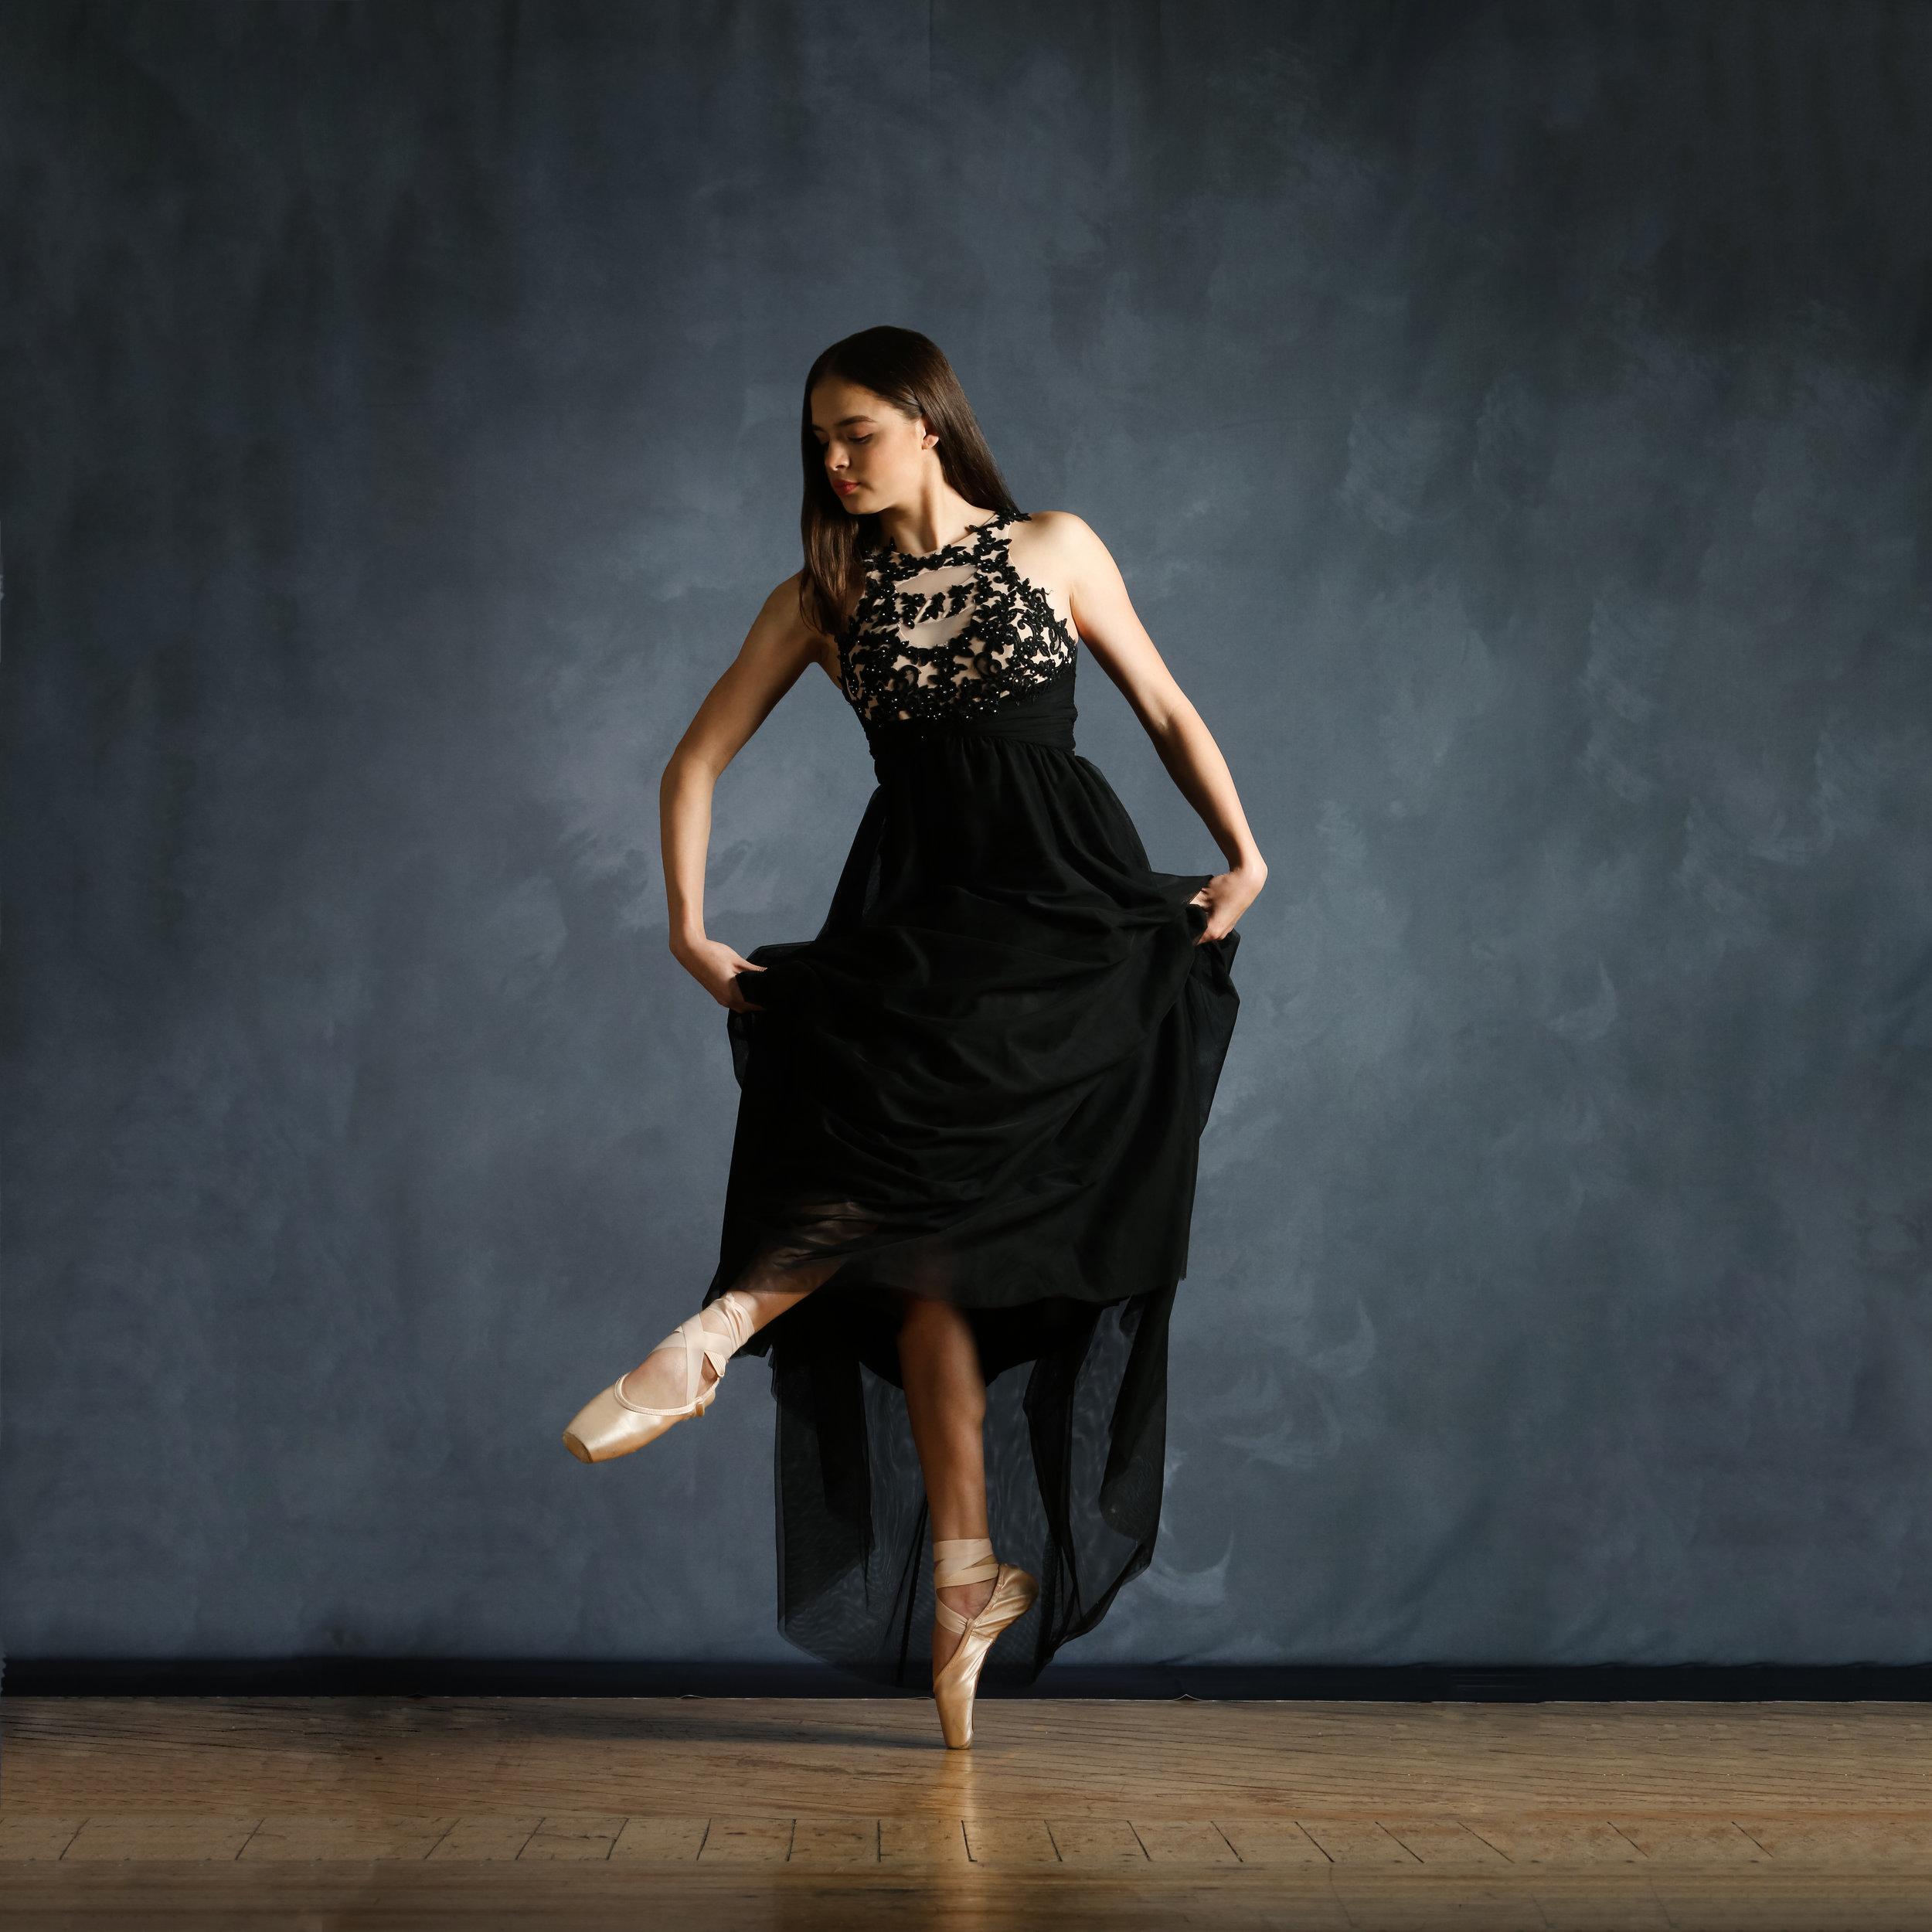 Dance0838-Edit_SQ.jpg